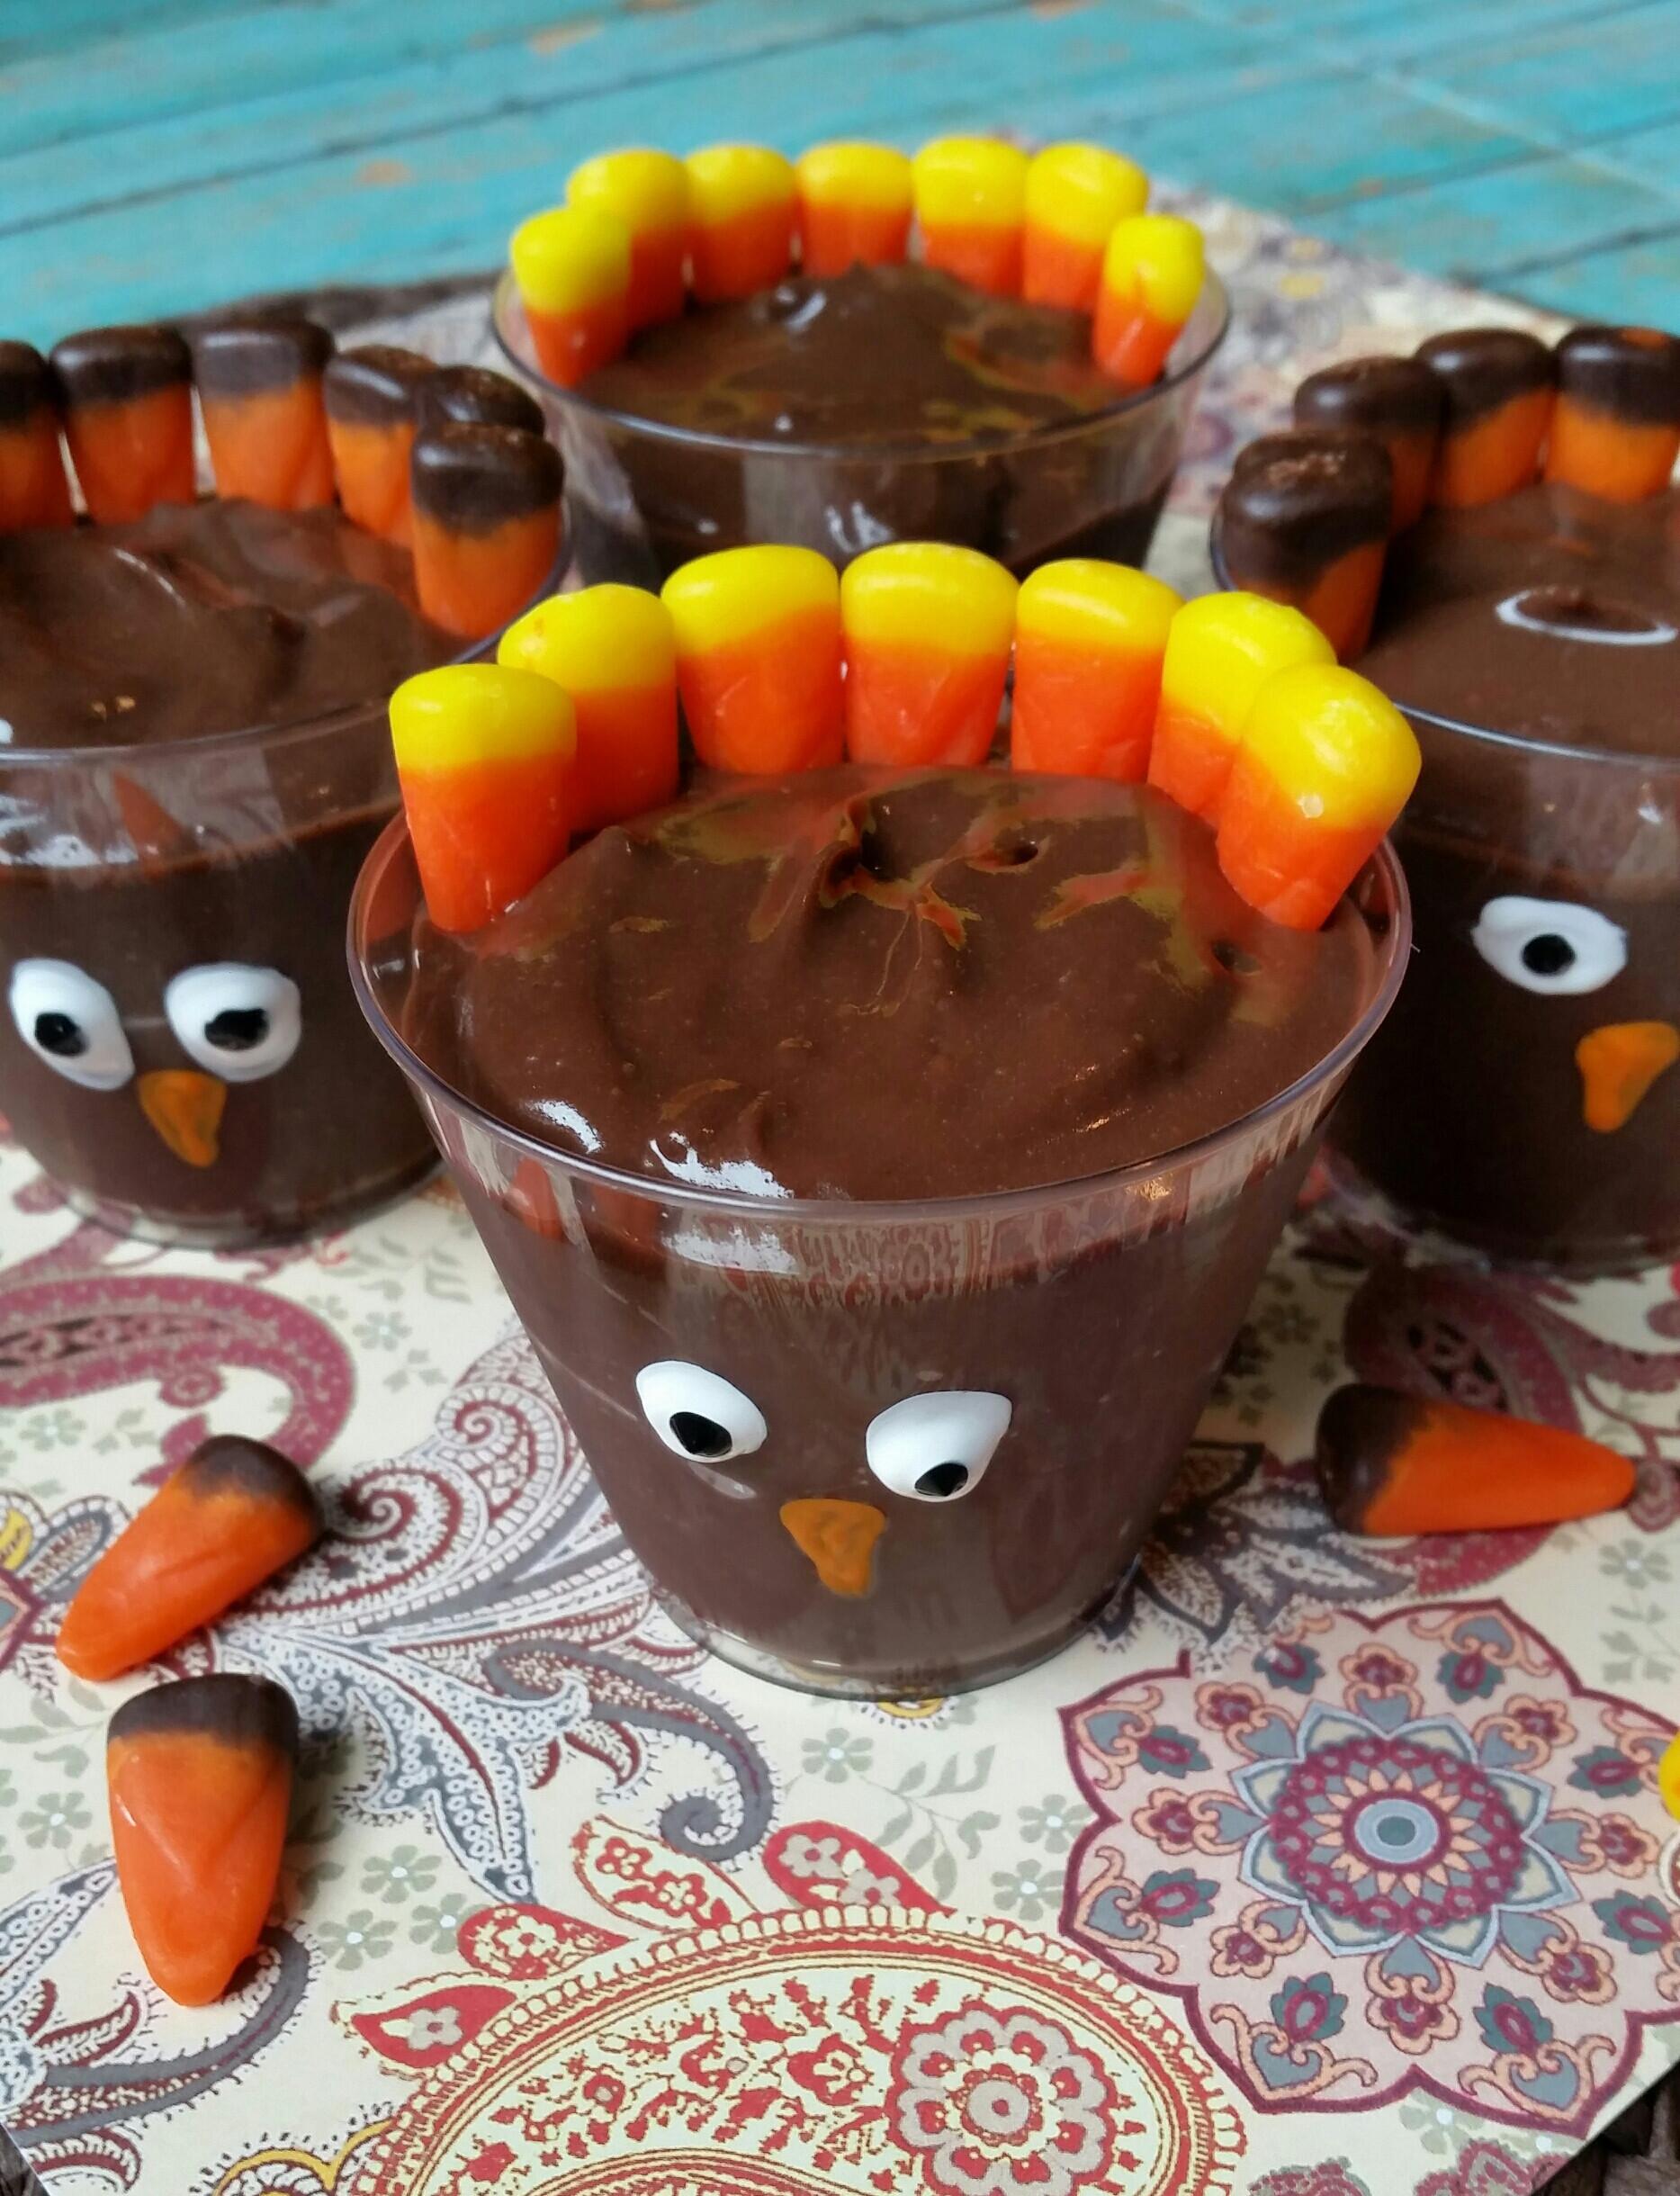 Desserts For Thanksgiving  Turkey Dessert Shooters Easy Thanksgiving Recipe Not